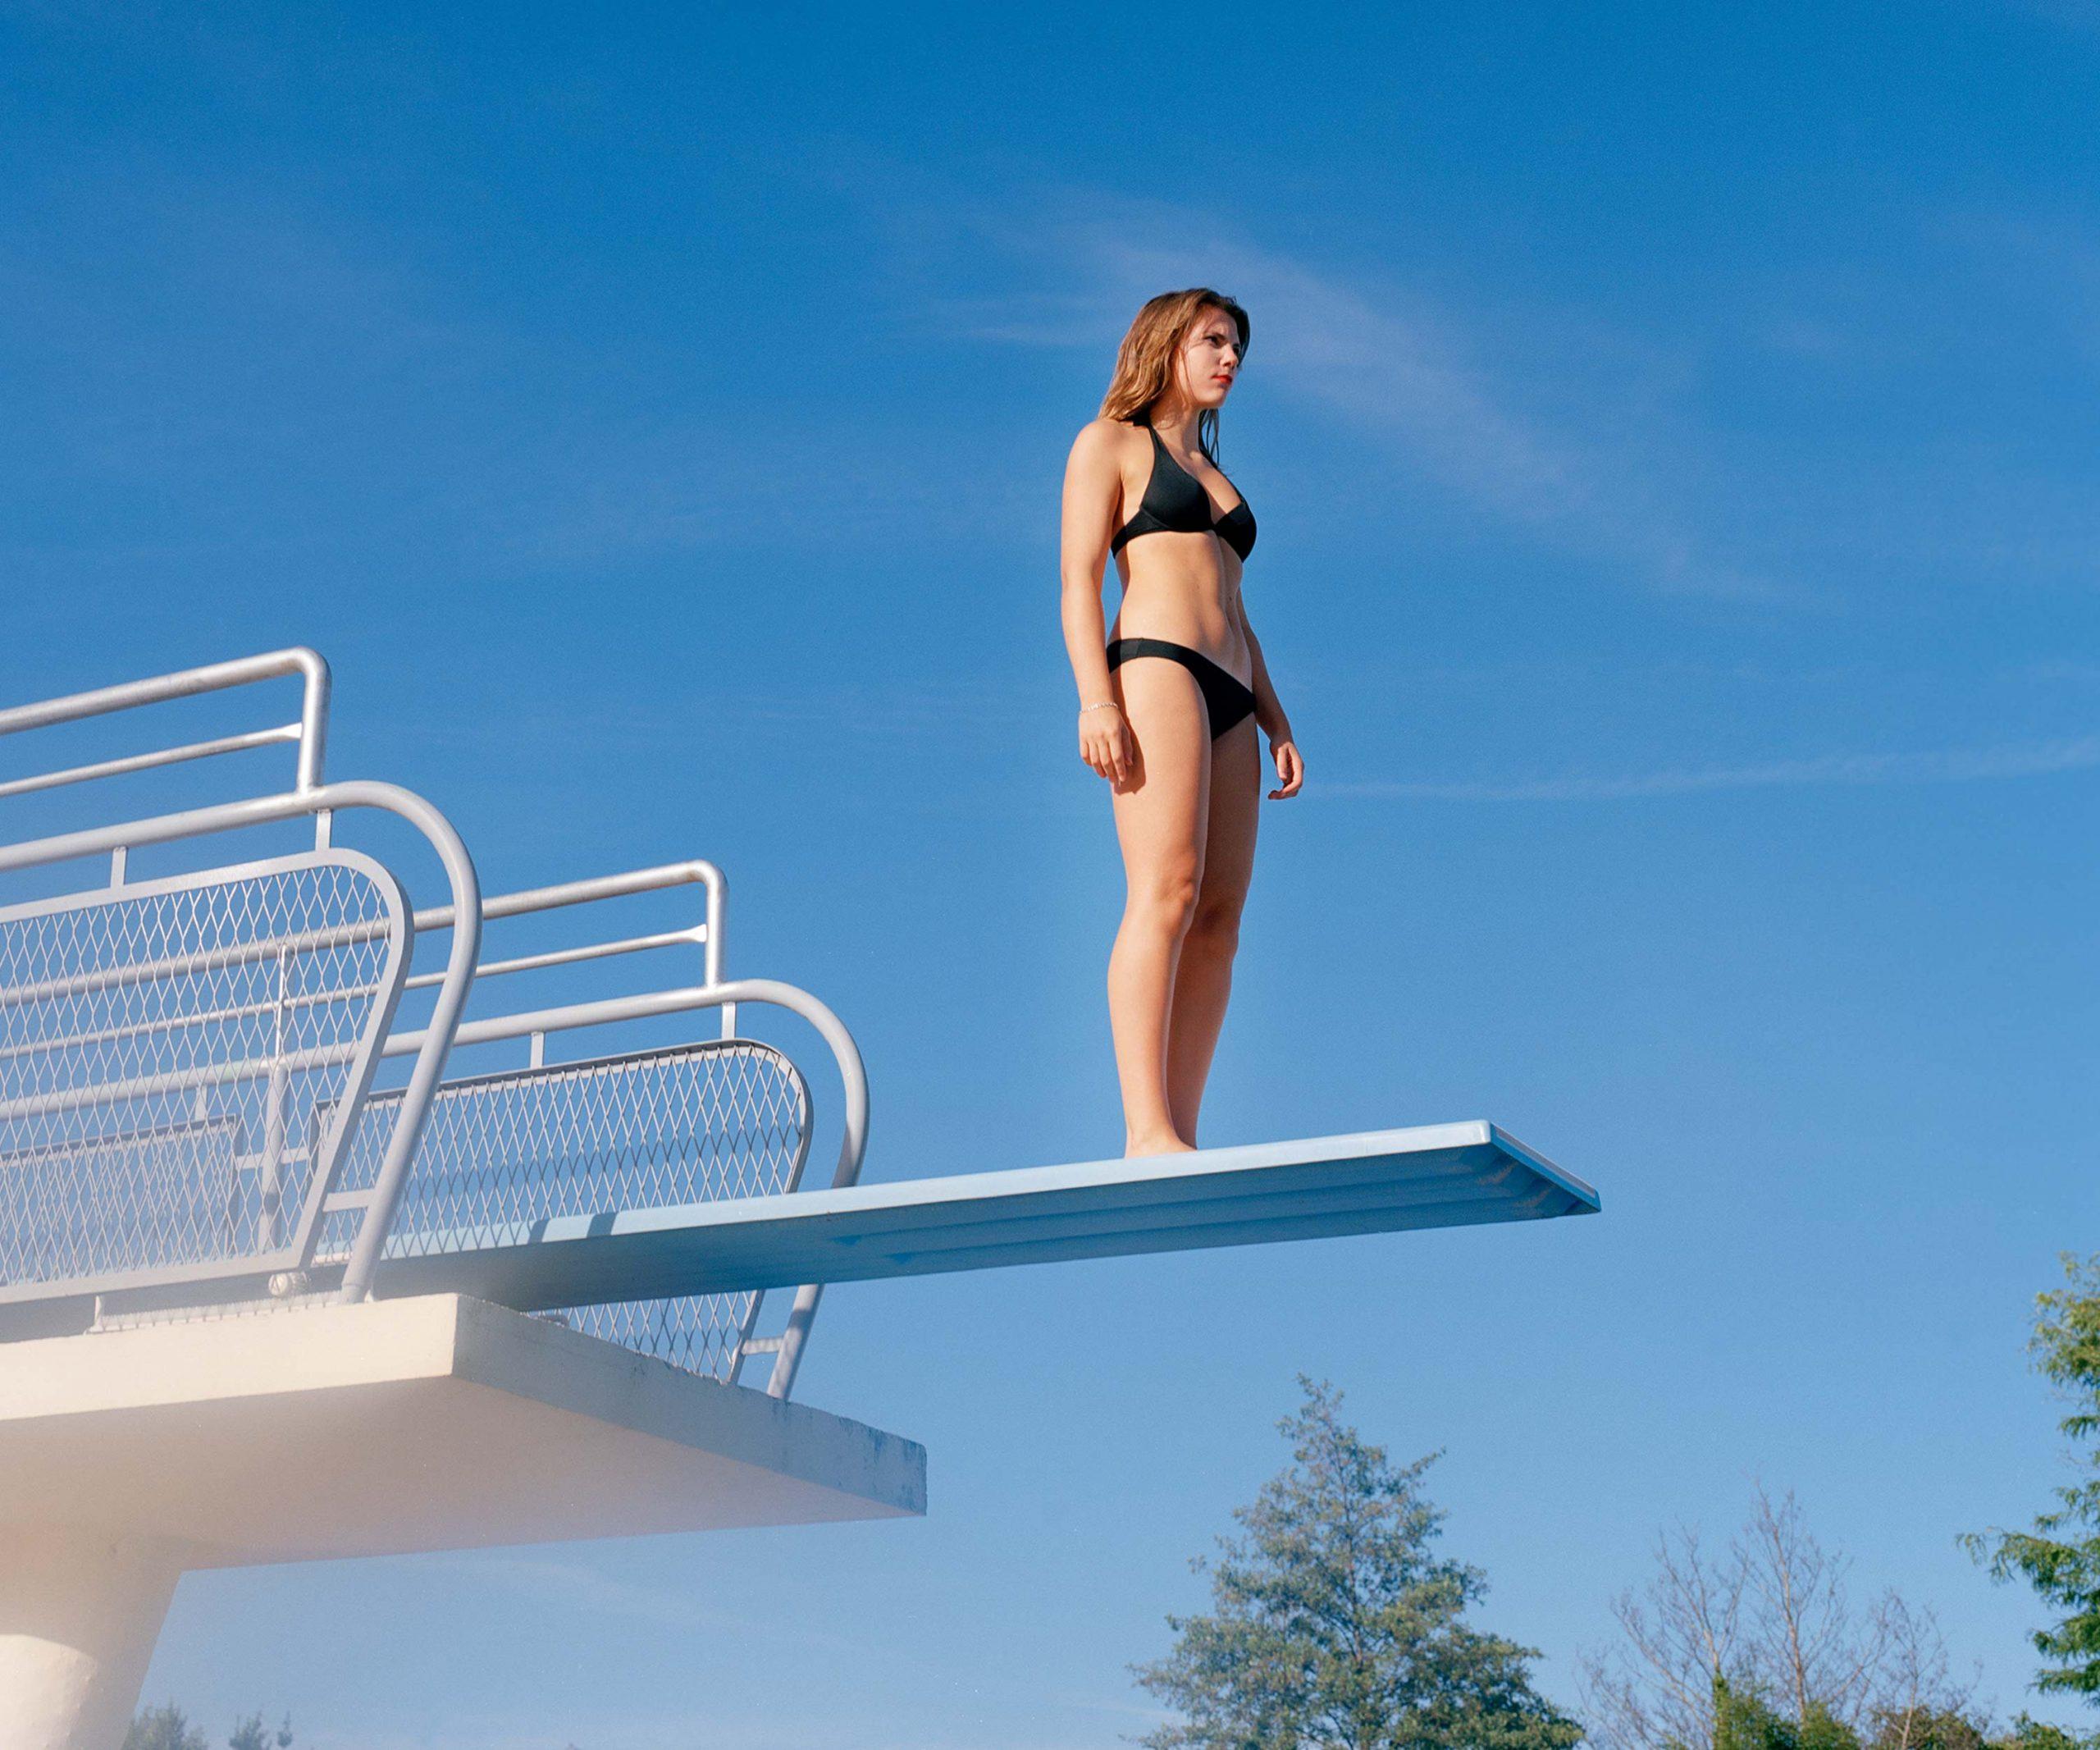 Wren-Agency-Rachel-Louise-Brown- Les Femmes - 03